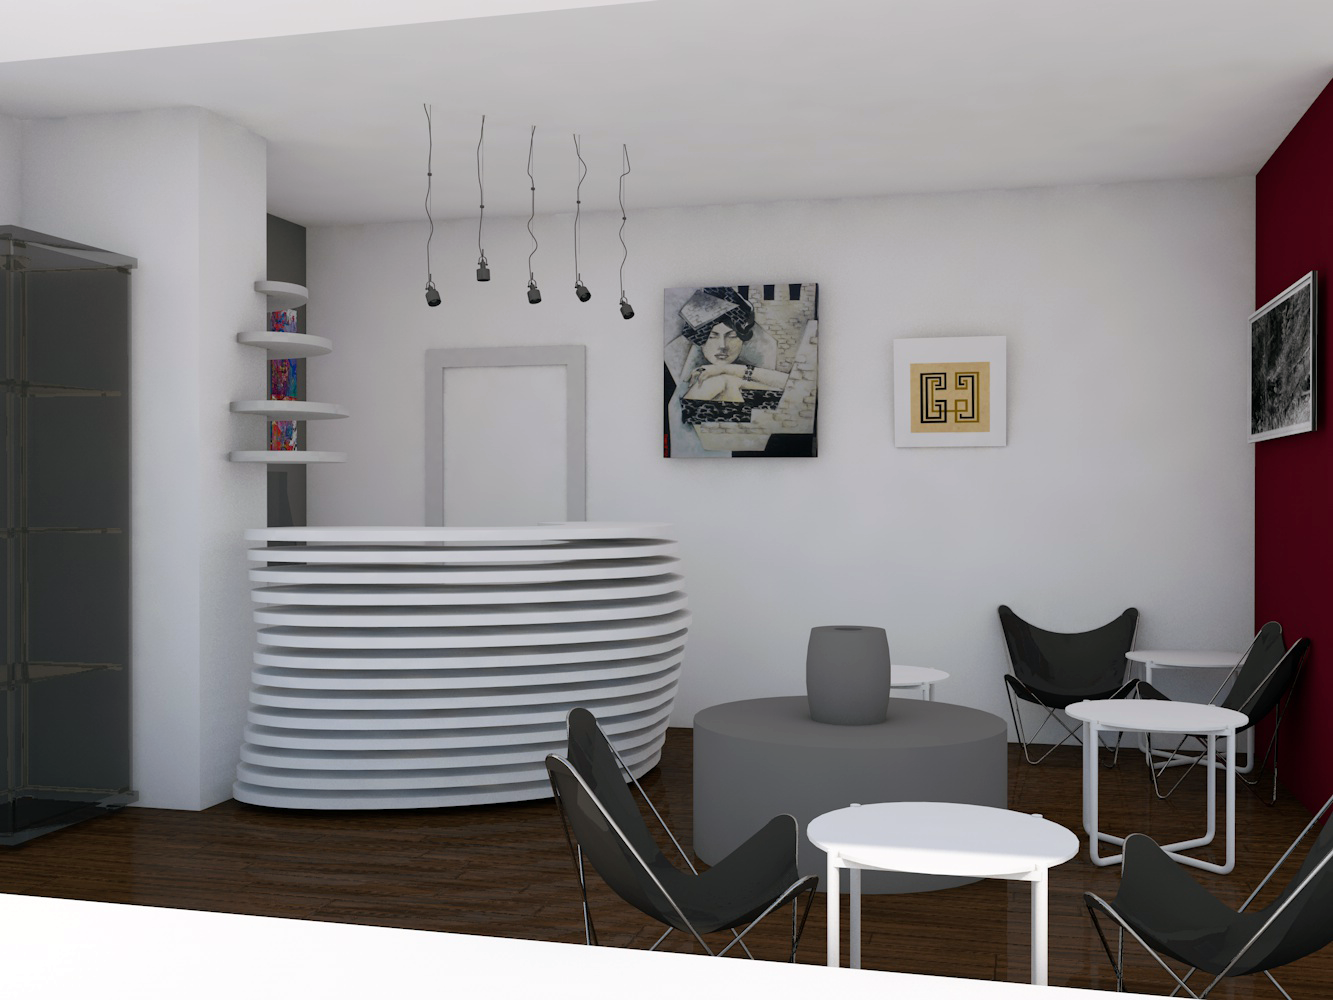 Viva Art_Interior-Bild2